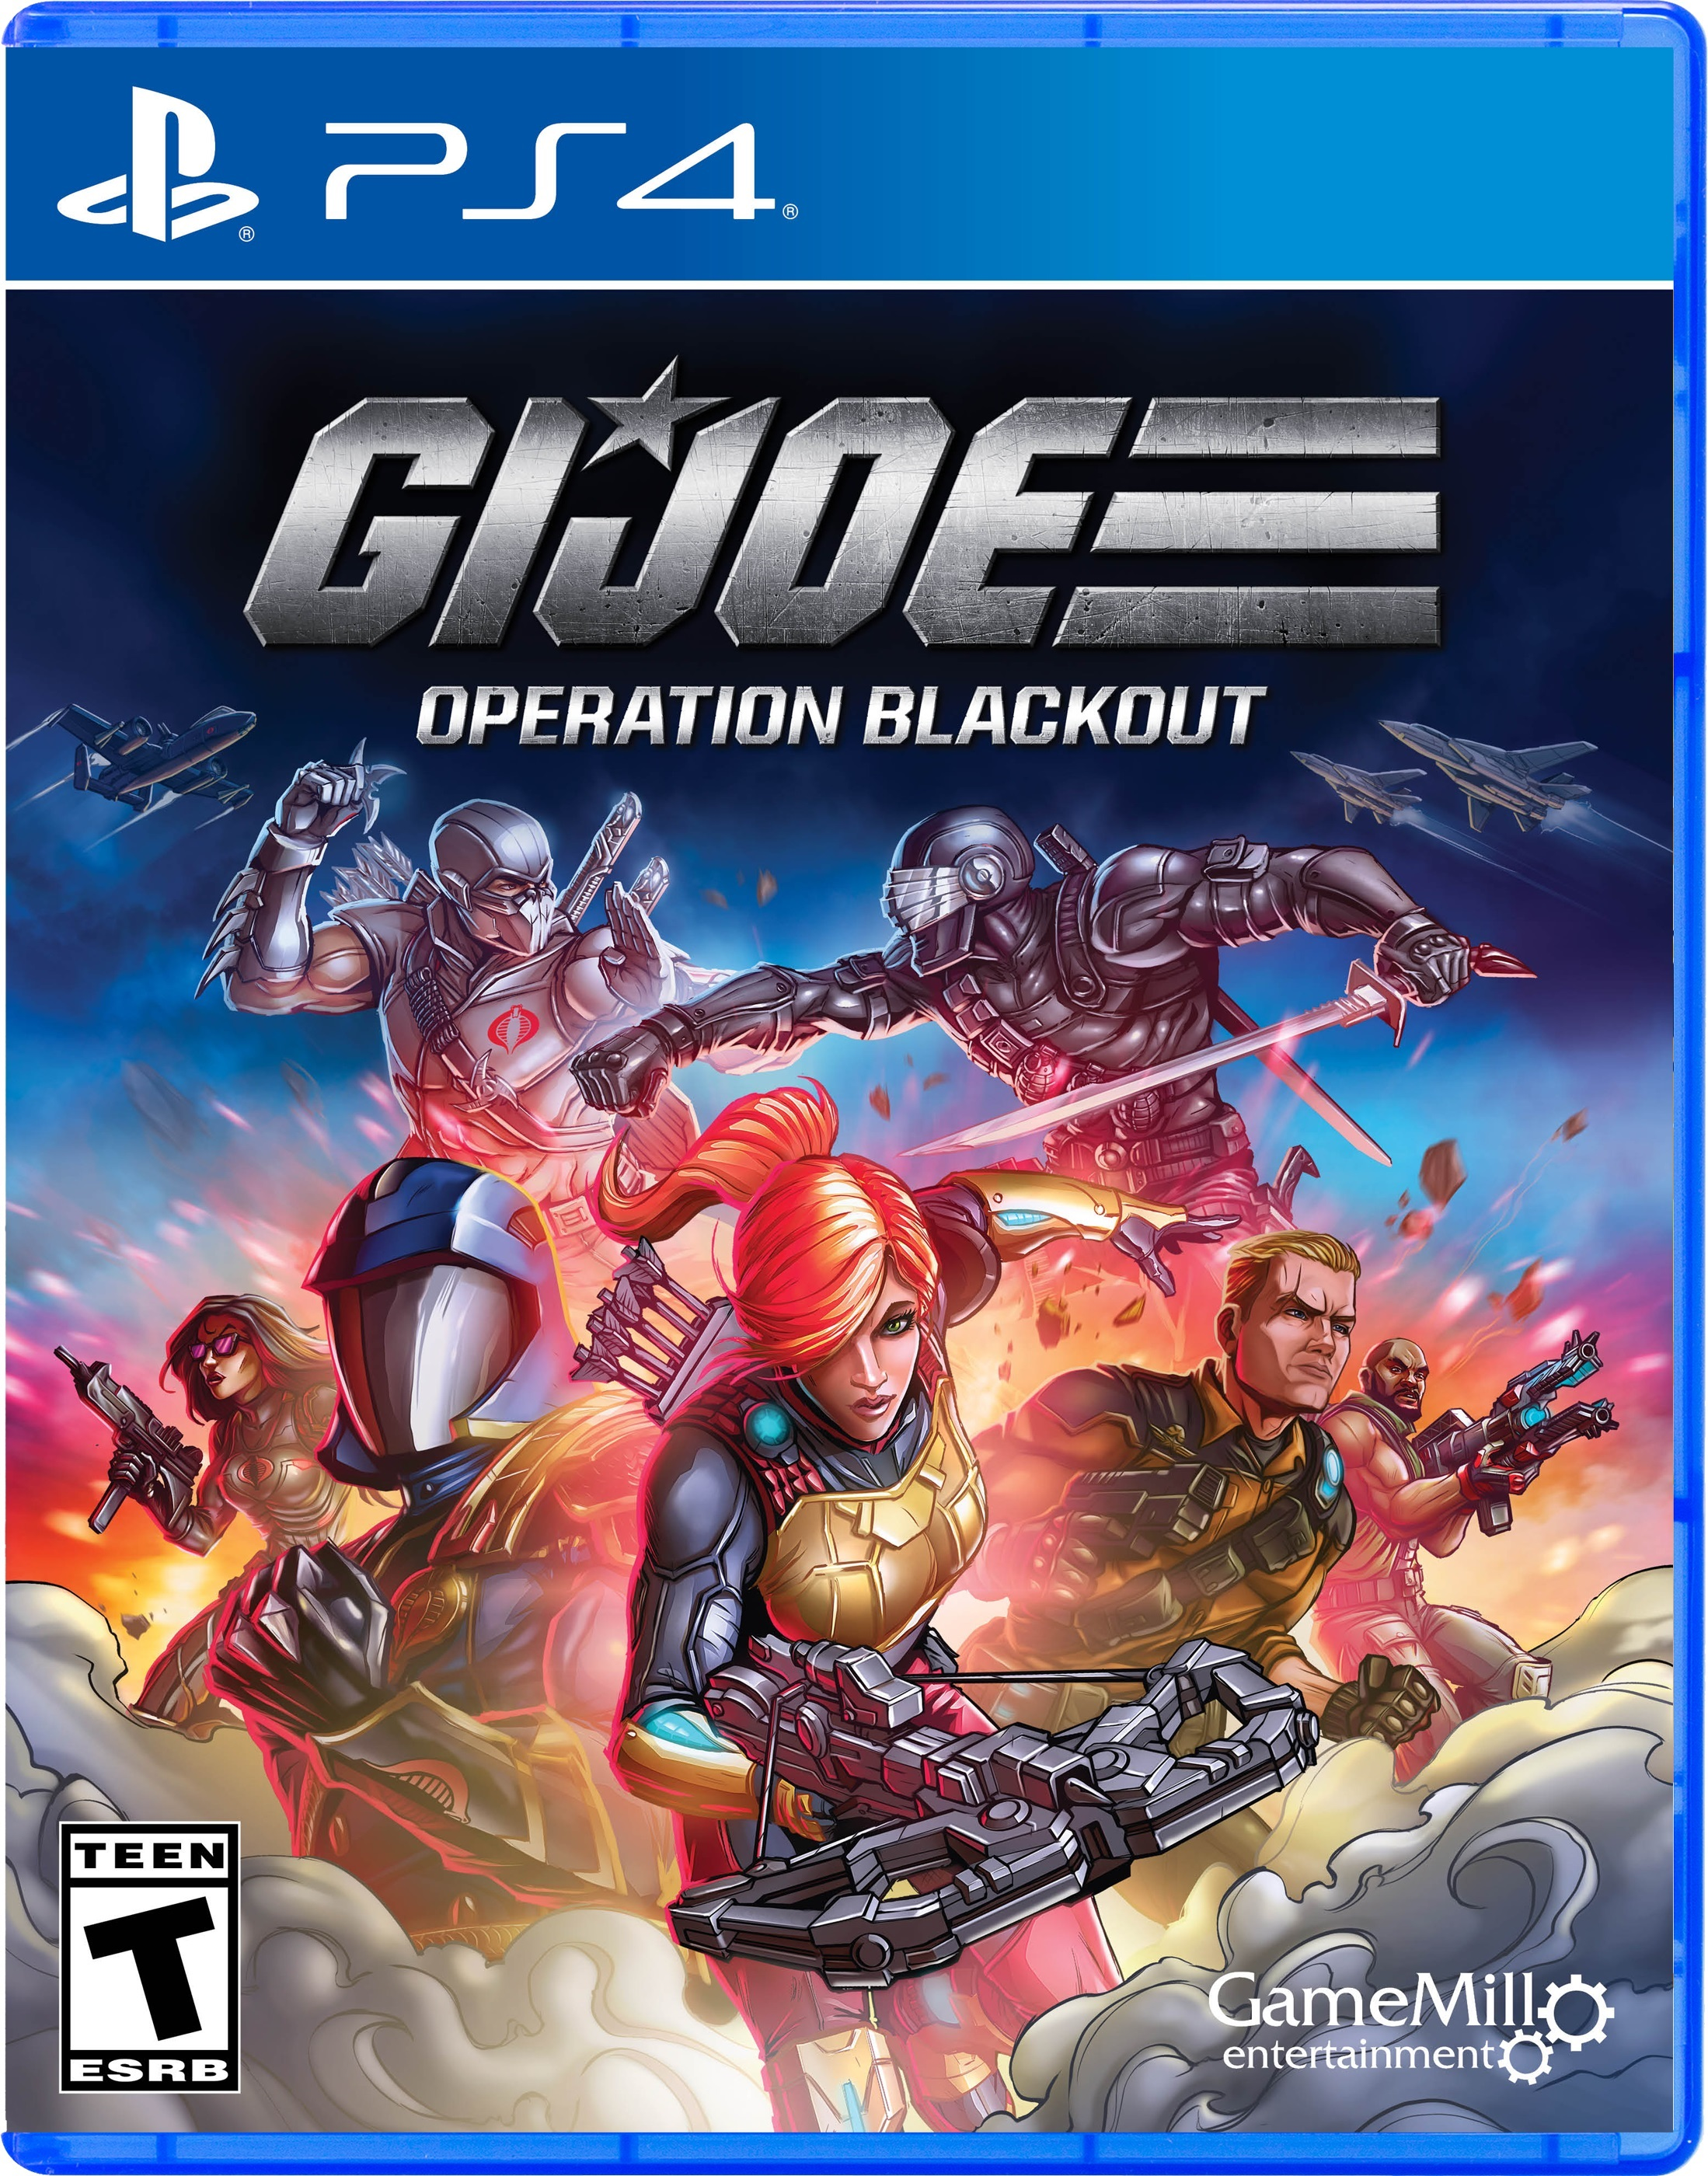 Gi Joe Operation Blackout, GameMill, PlayStation 4, 856131008190